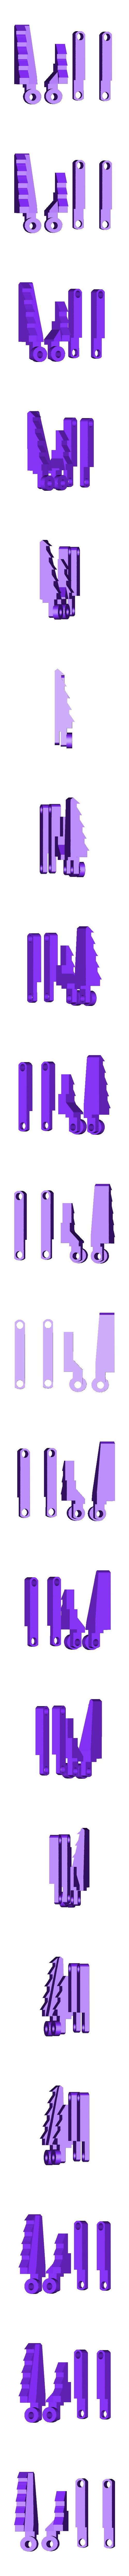 Back movable armgrips.stl Download STL file Keyboard arrow keys KEYSTICK gaming joystick  • 3D print template, lap88777